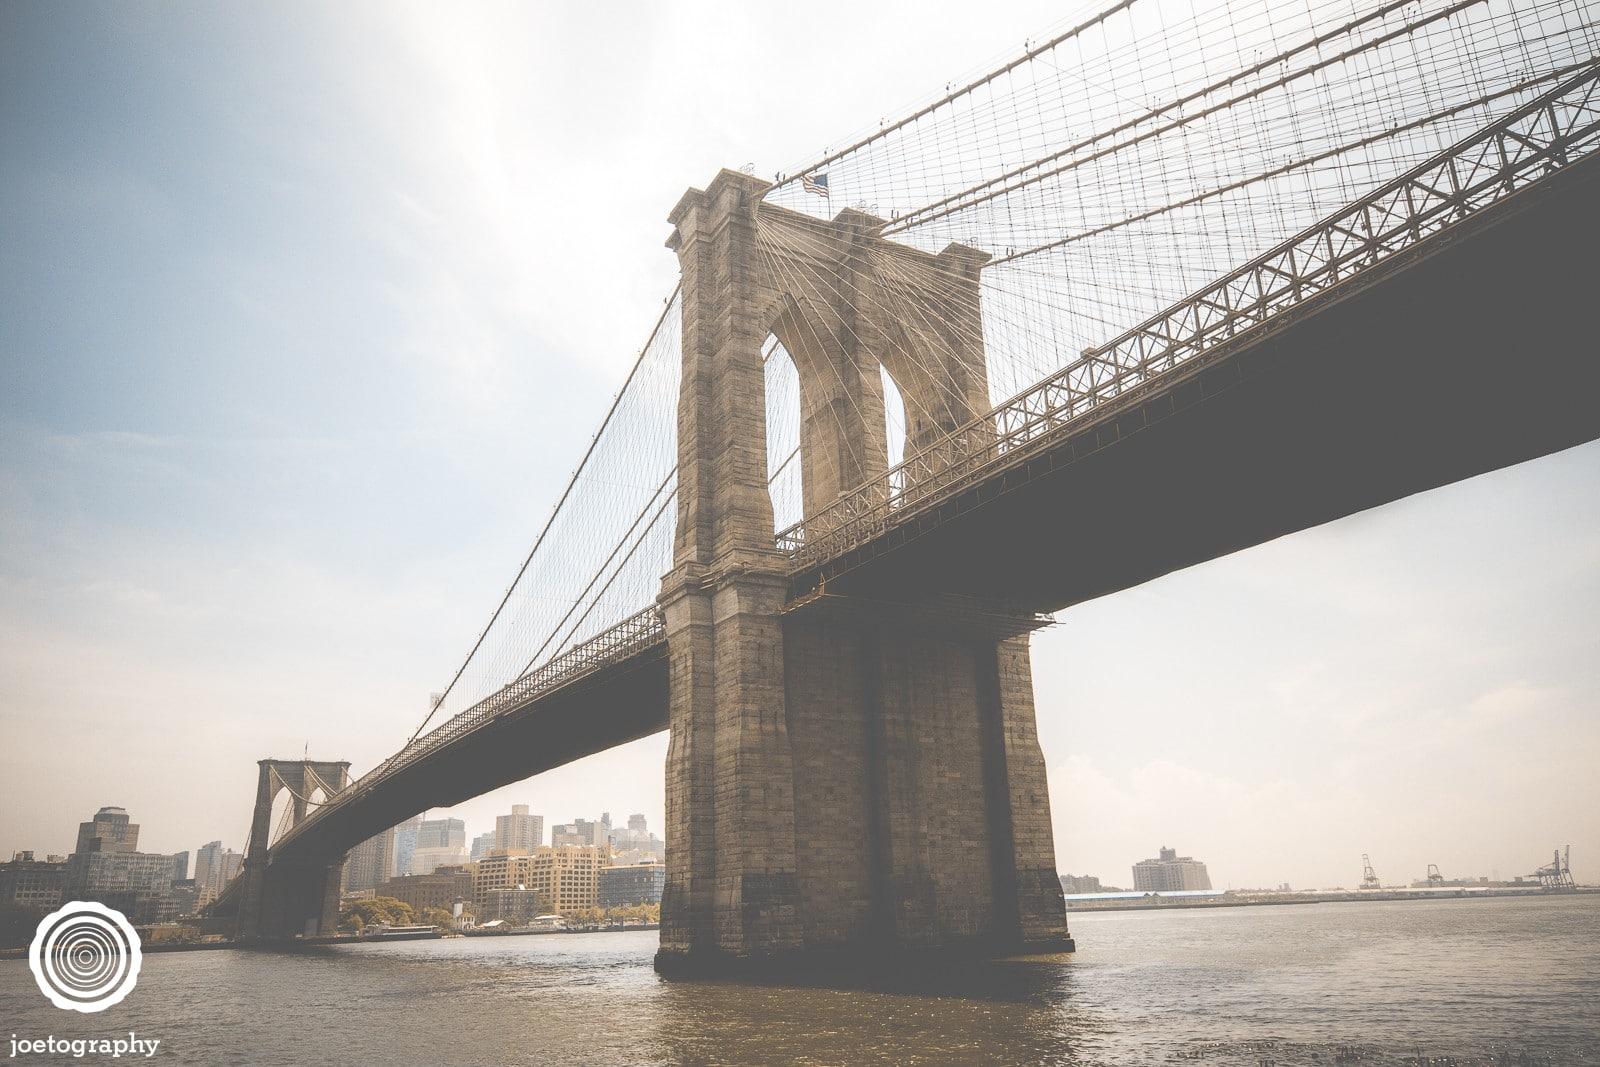 joetography-travel-photography-new-york-city-2015-10